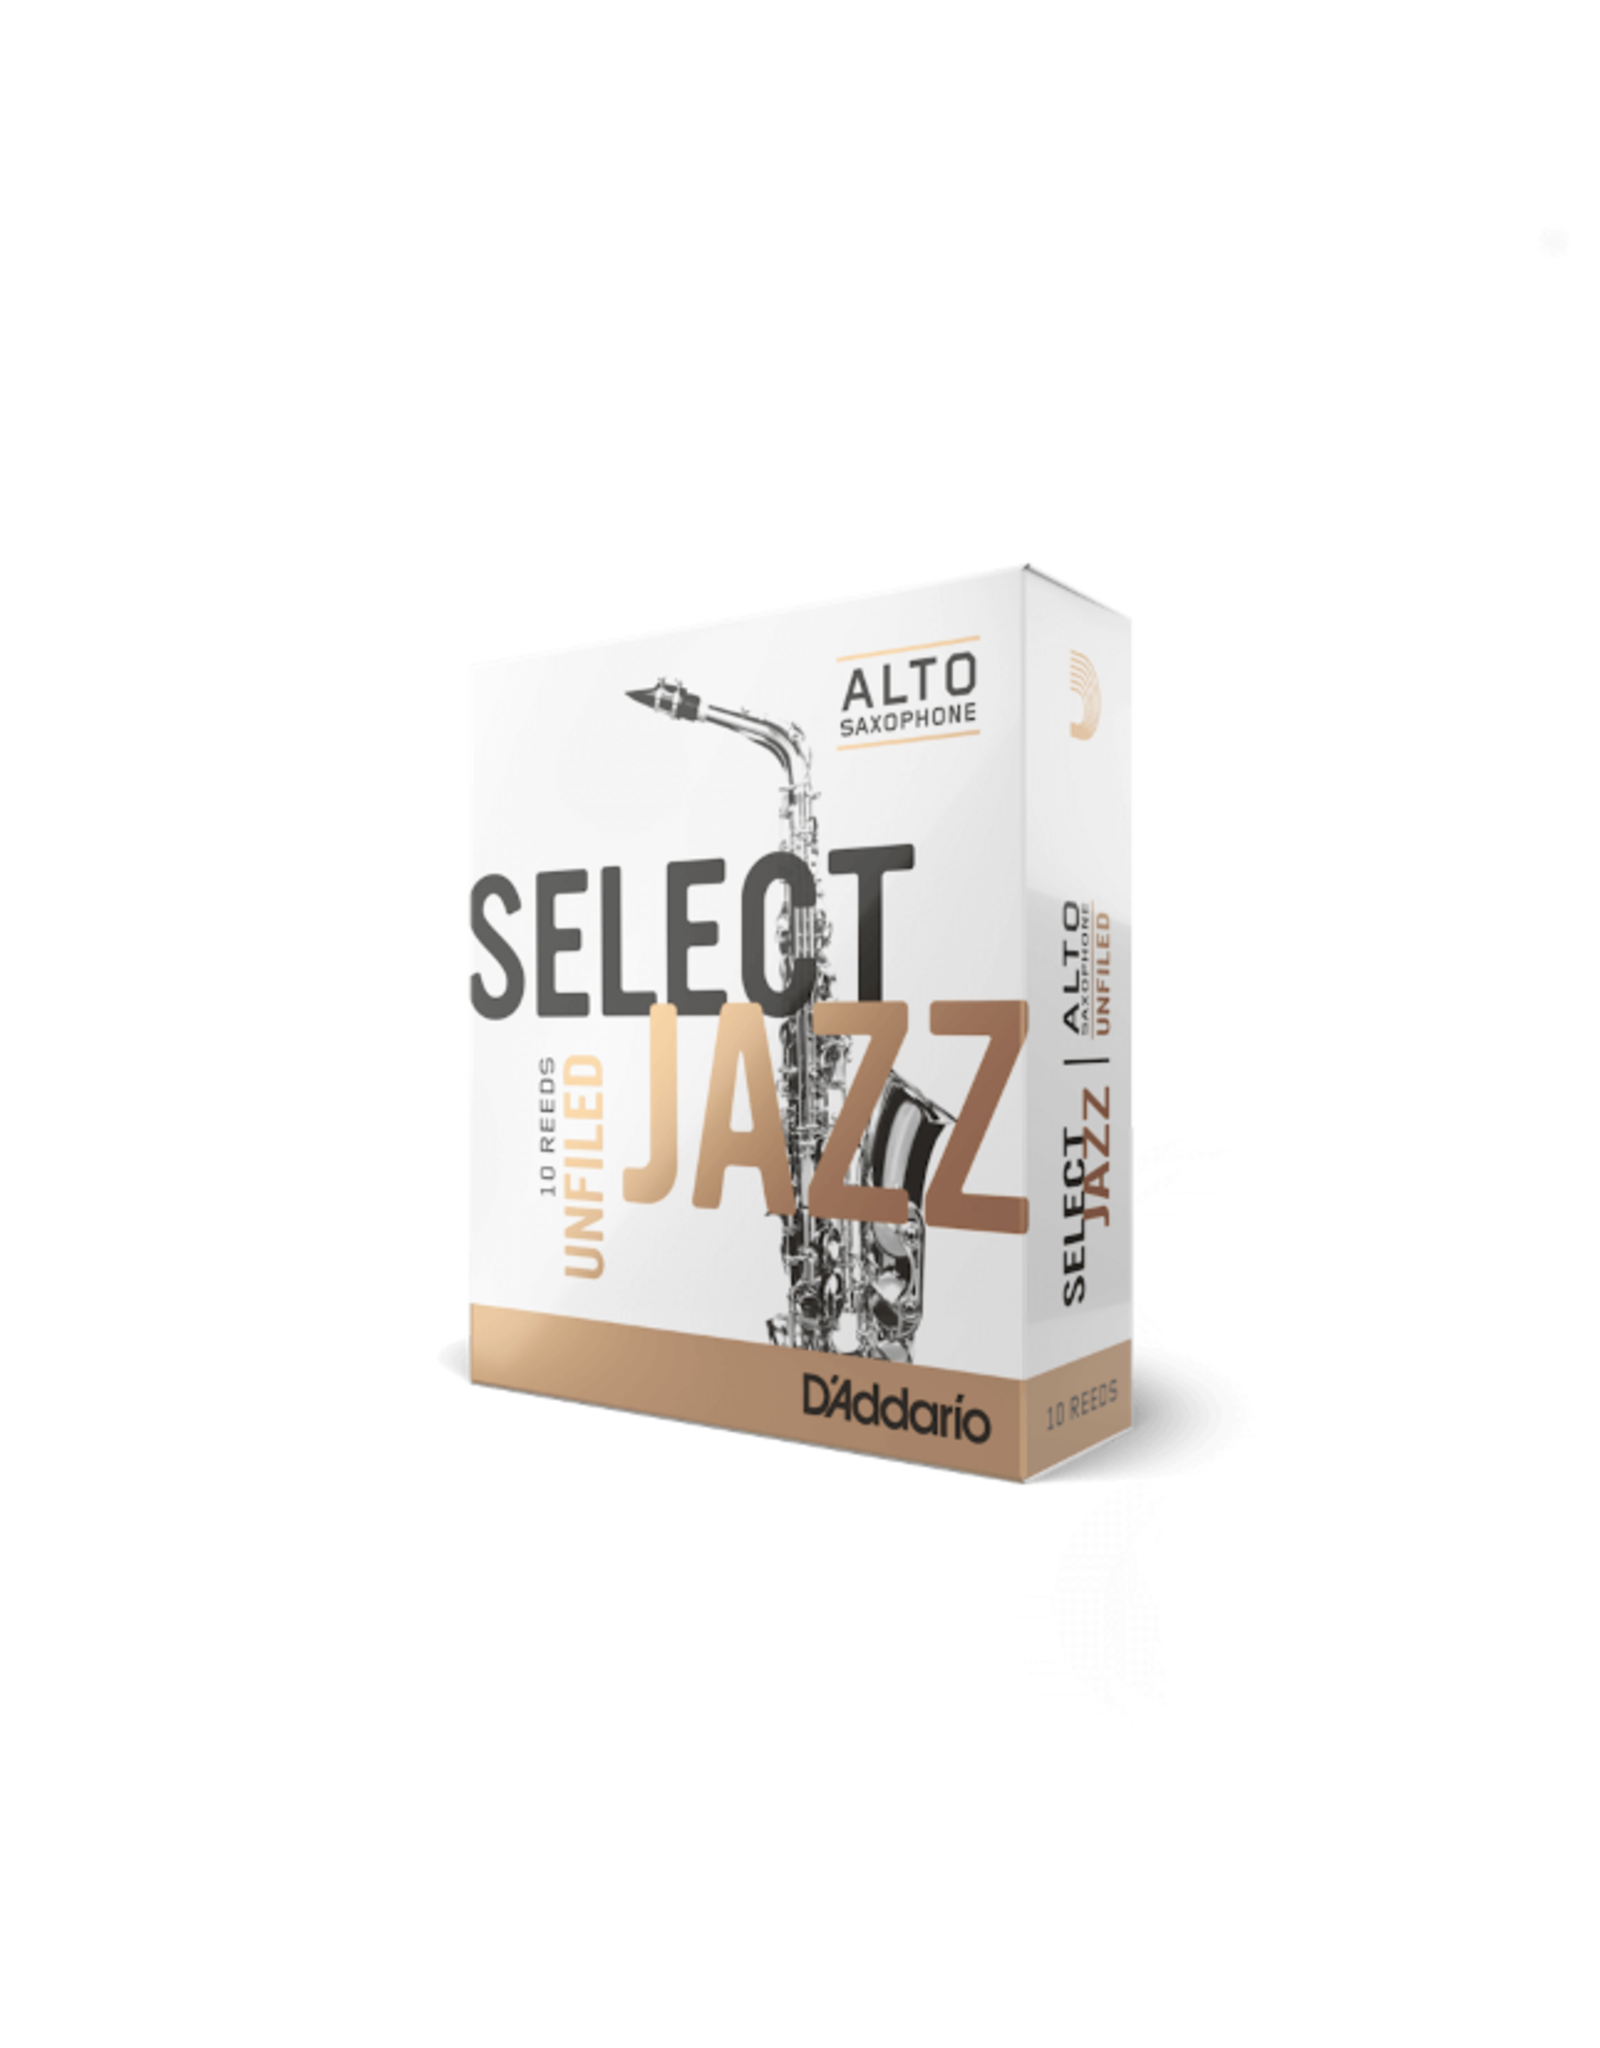 D'Addario D'addario Select Jazz Alt sax rietjes unfiled